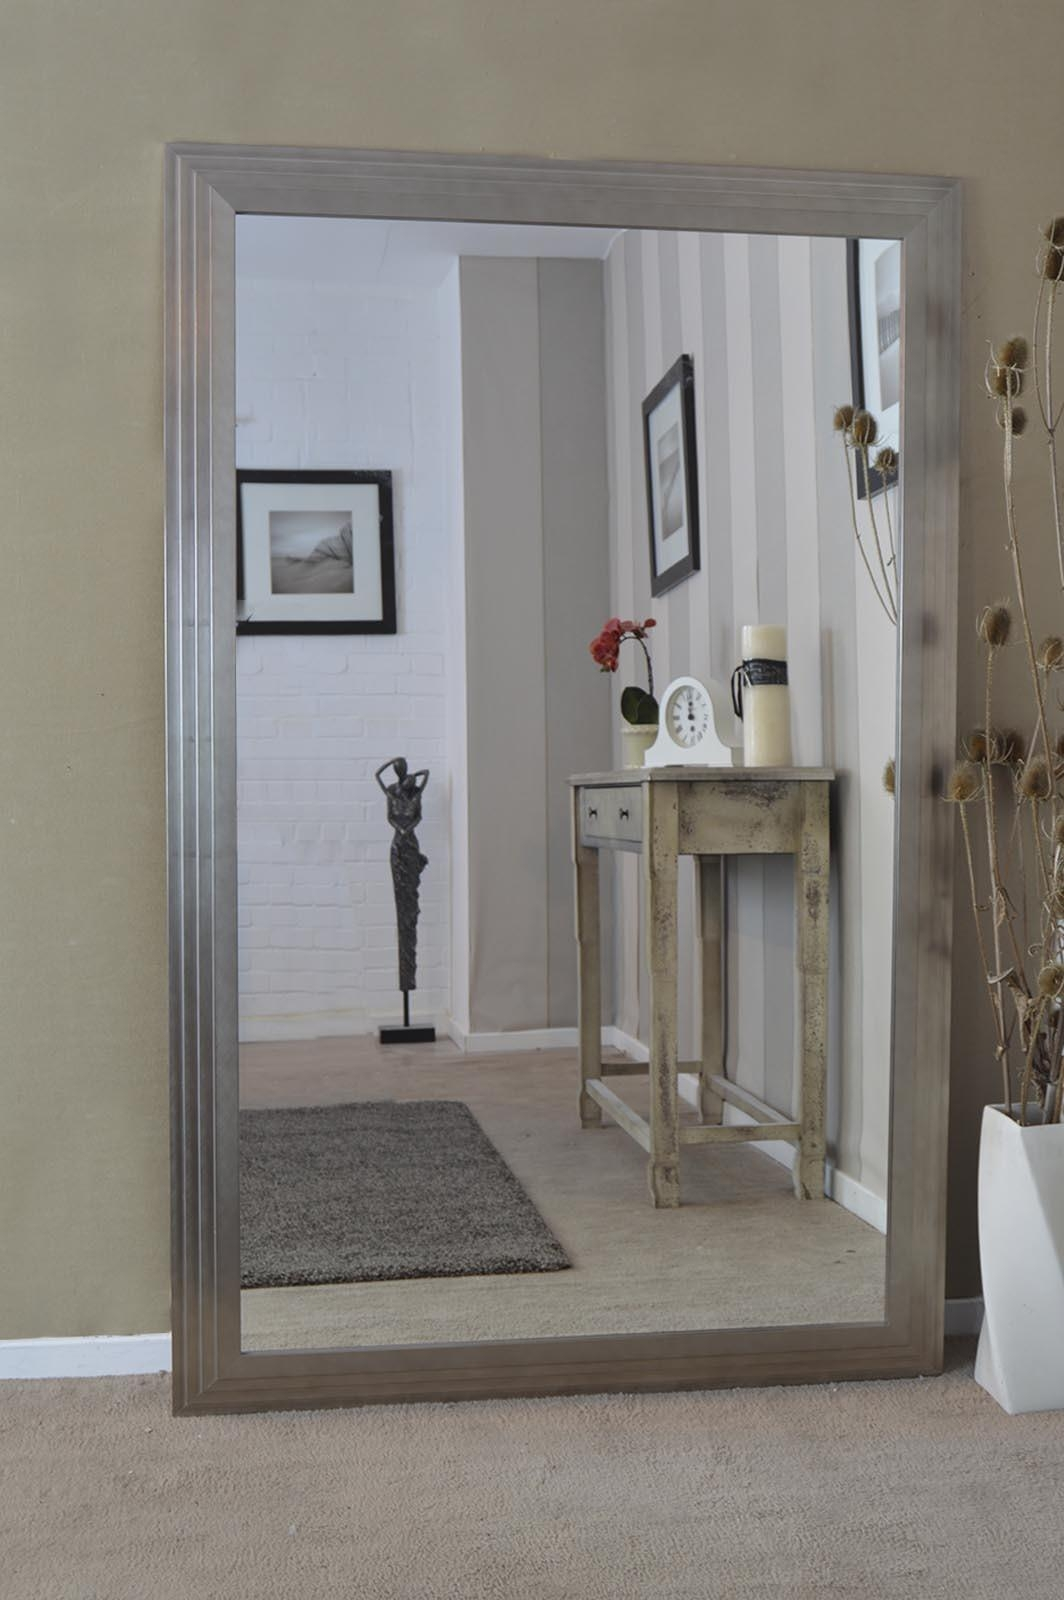 Extra Large Wall Mirrors Extra Large Wall Mirror New #9628 Regarding Big Wall Mirrors (Photo 2 of 20)